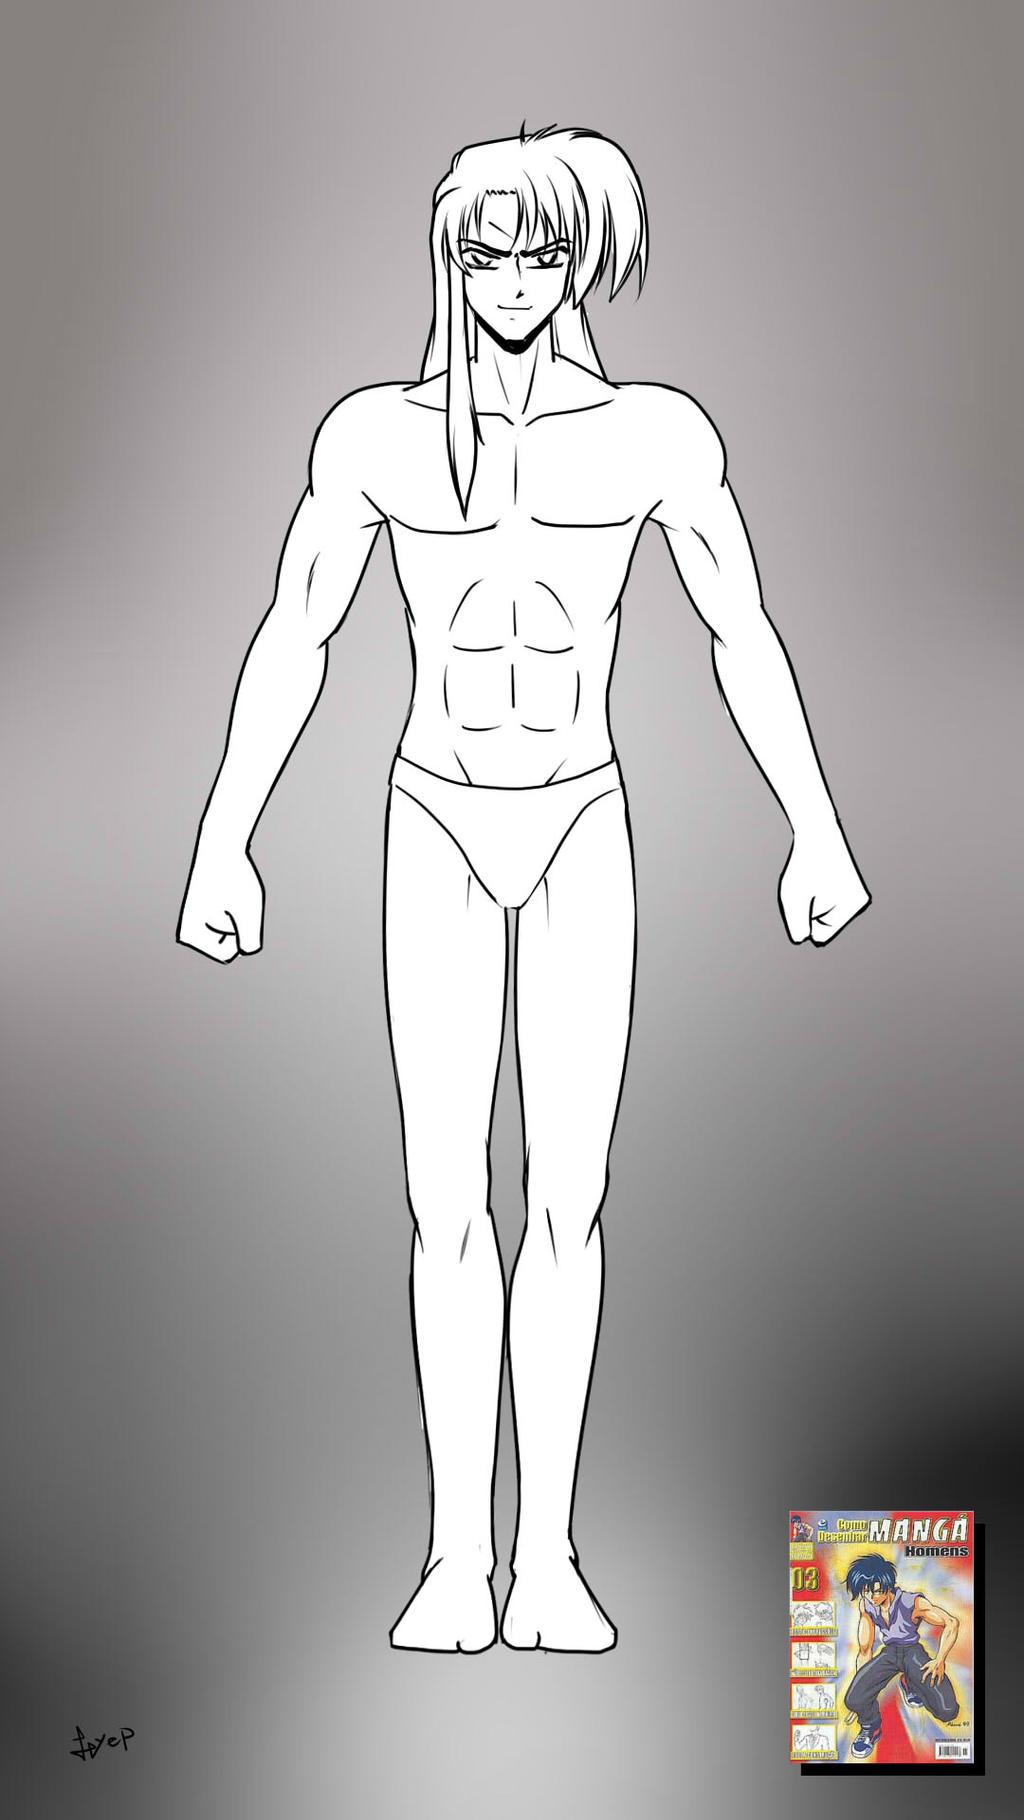 Anatomia masculina by Leandroyepyep on DeviantArt